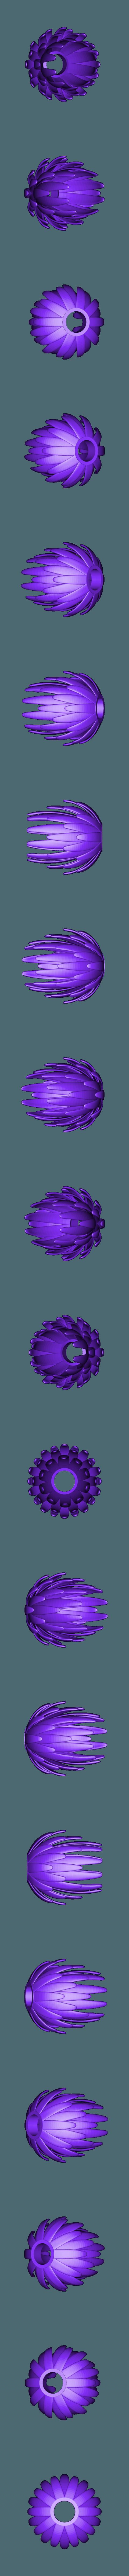 lamp3.STL Download free STL file Flower Lamp • Design to 3D print, Gathnobrain